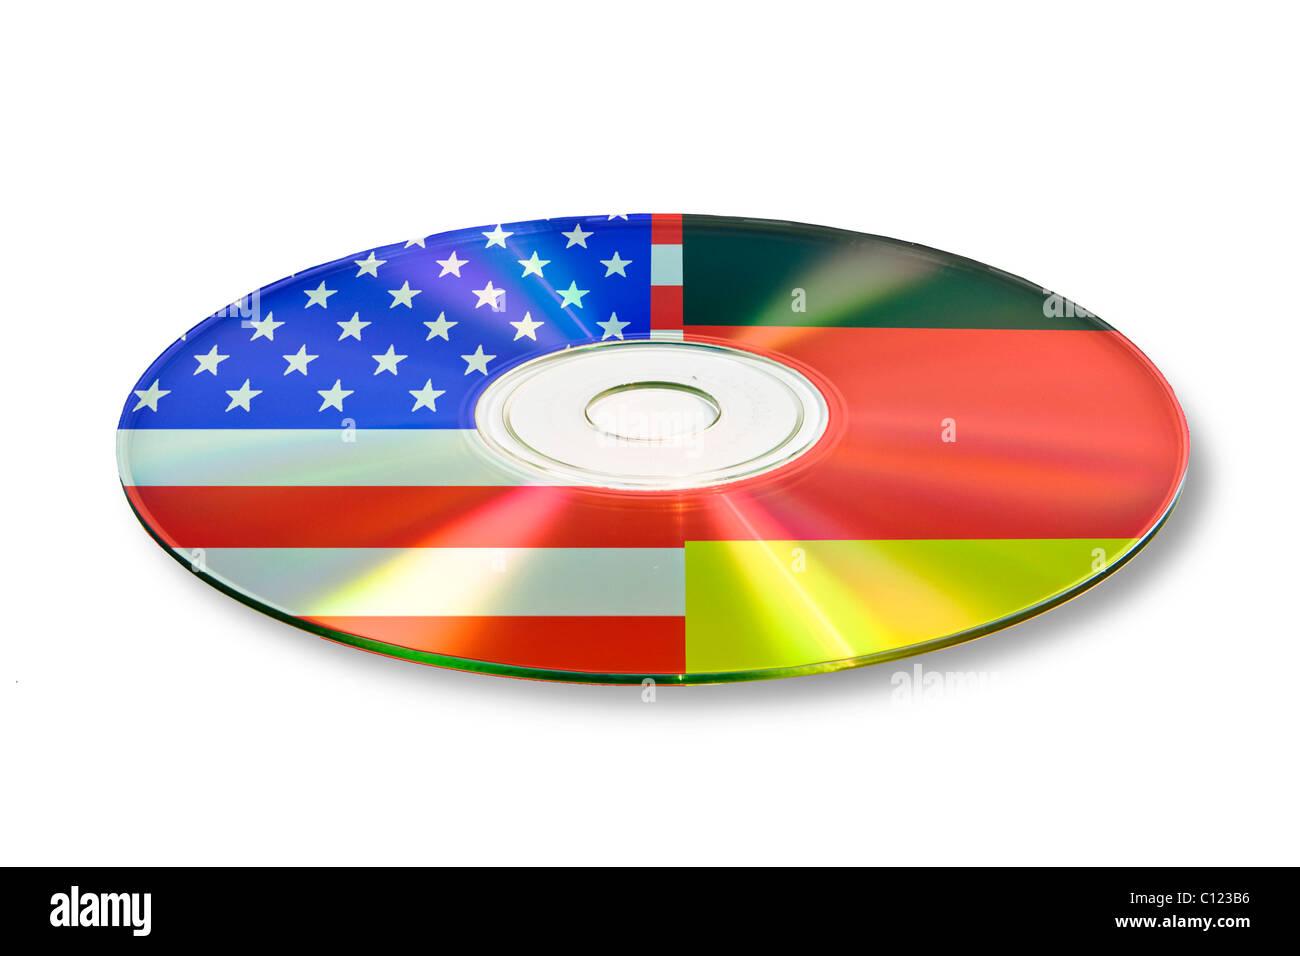 Symbolic image data exchange, account information, on CD, DVD, Germany - USA - Stock Image